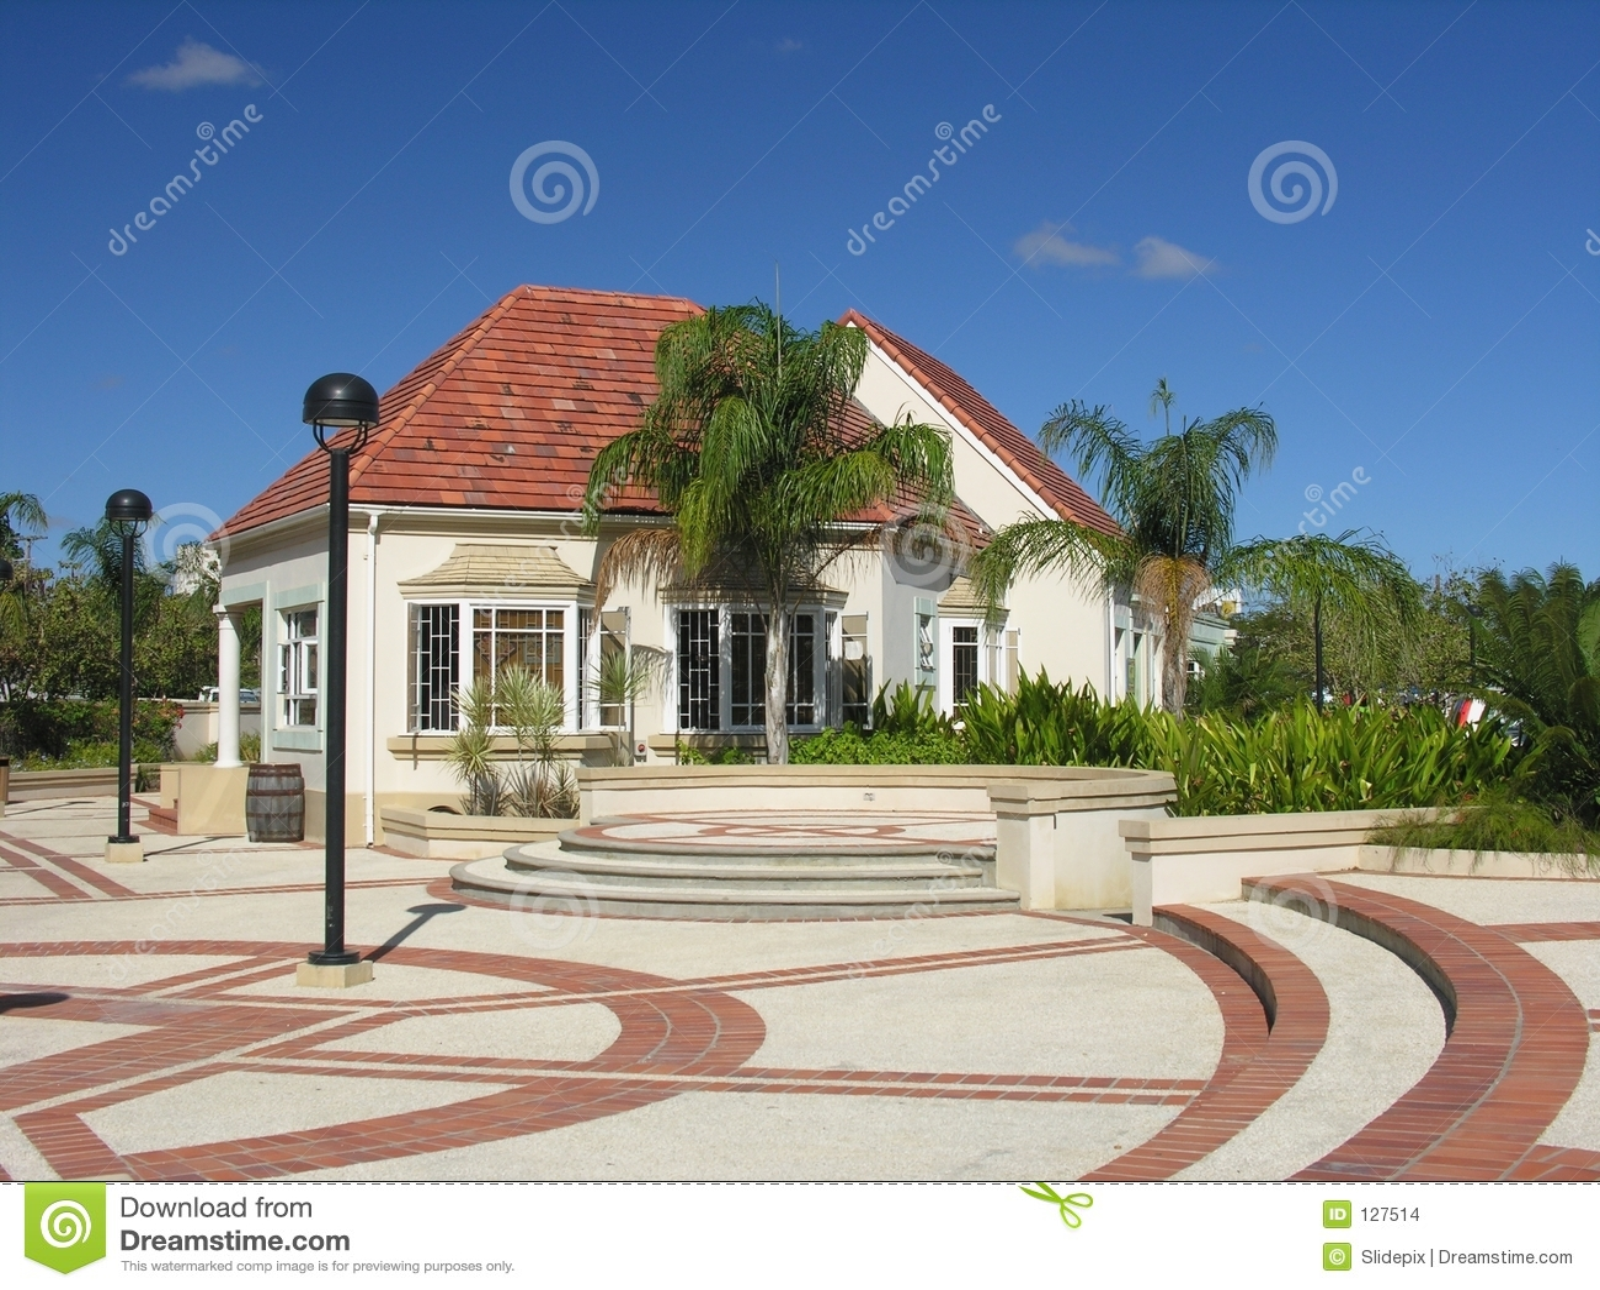 Modern Caribbean Architecture Home Design